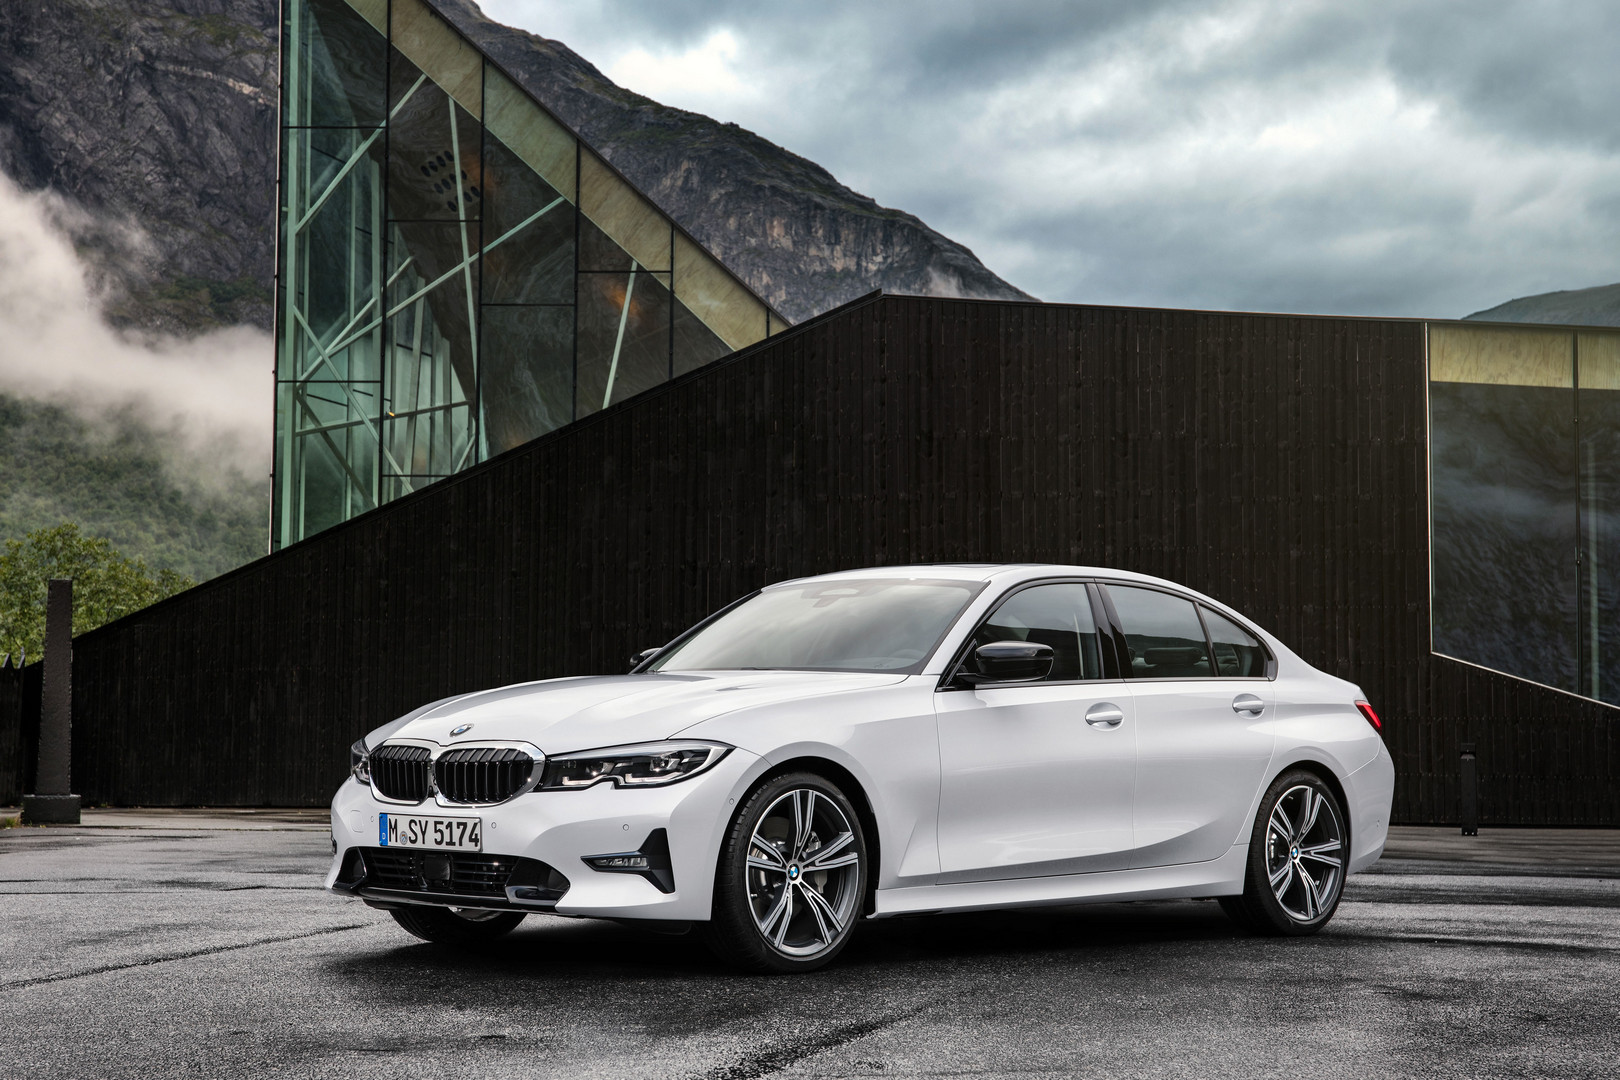 2019 BMW 3 Series G20 Front